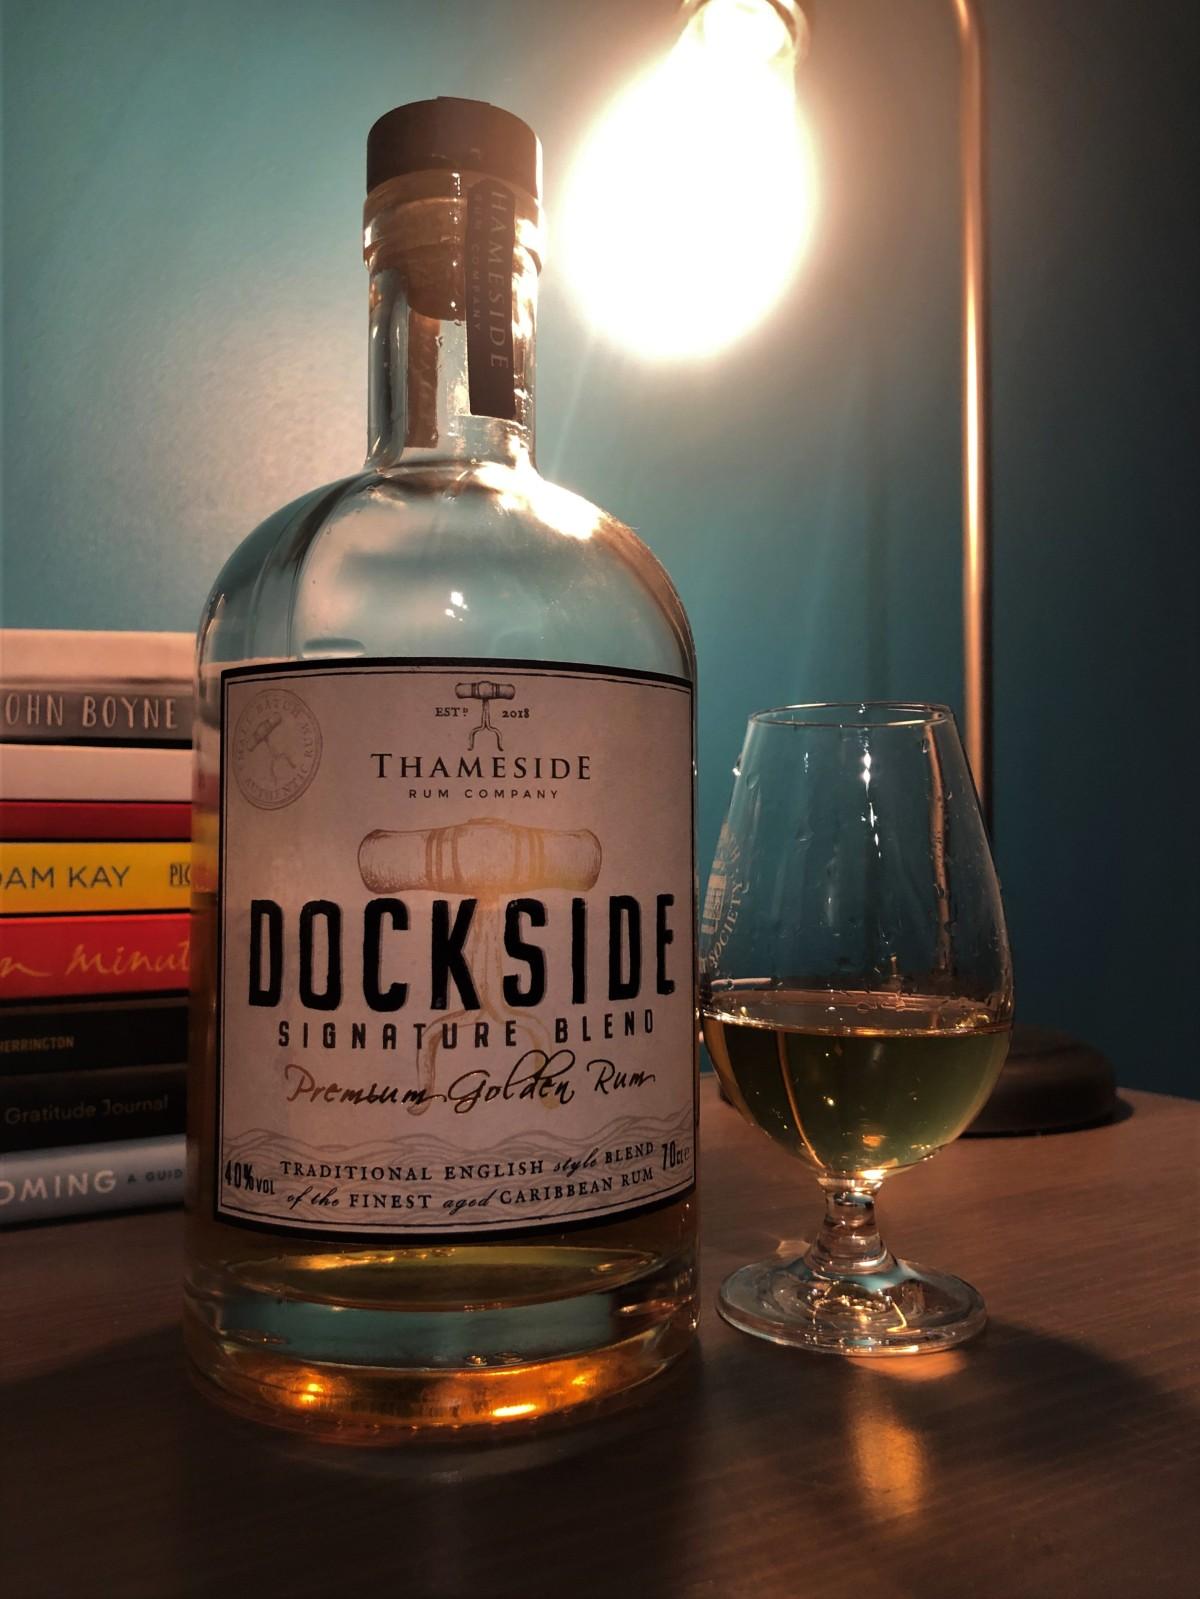 Thameside Rum Company: Dockside SignatureBlend